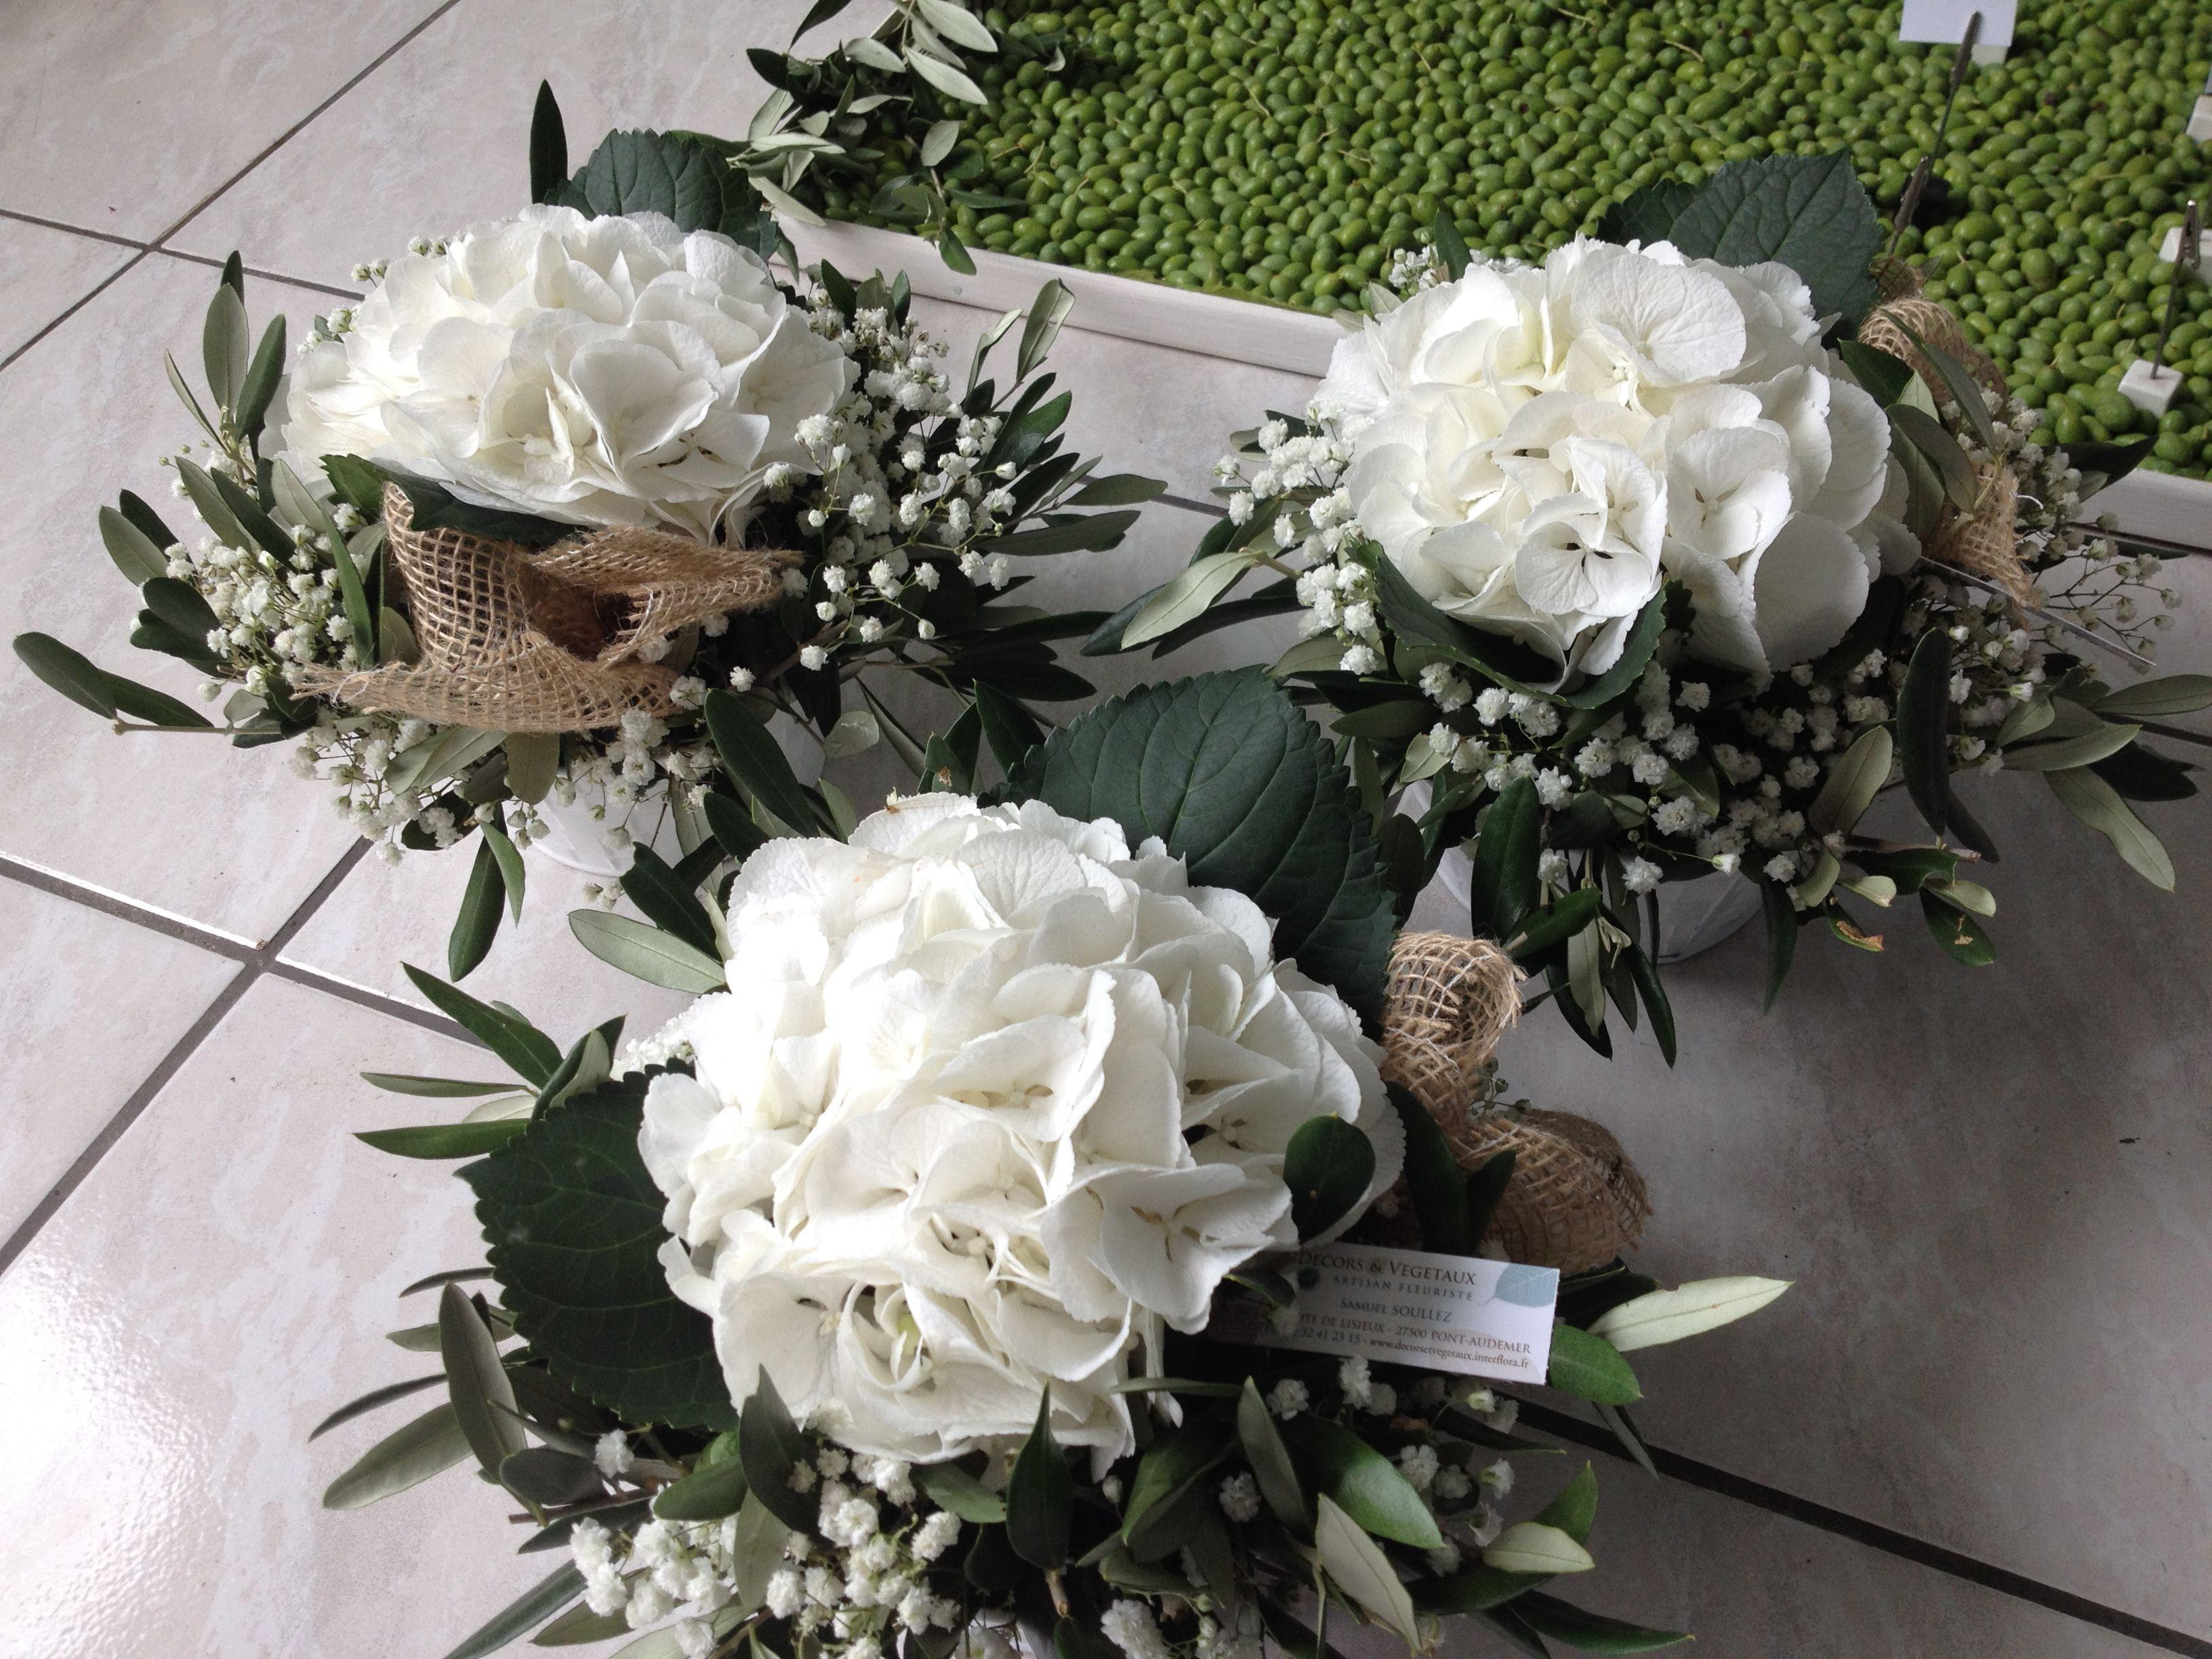 cr ations d cors v g taux mariage m diterran en a base d 39 hortensia blanc branche d 39 olivier. Black Bedroom Furniture Sets. Home Design Ideas